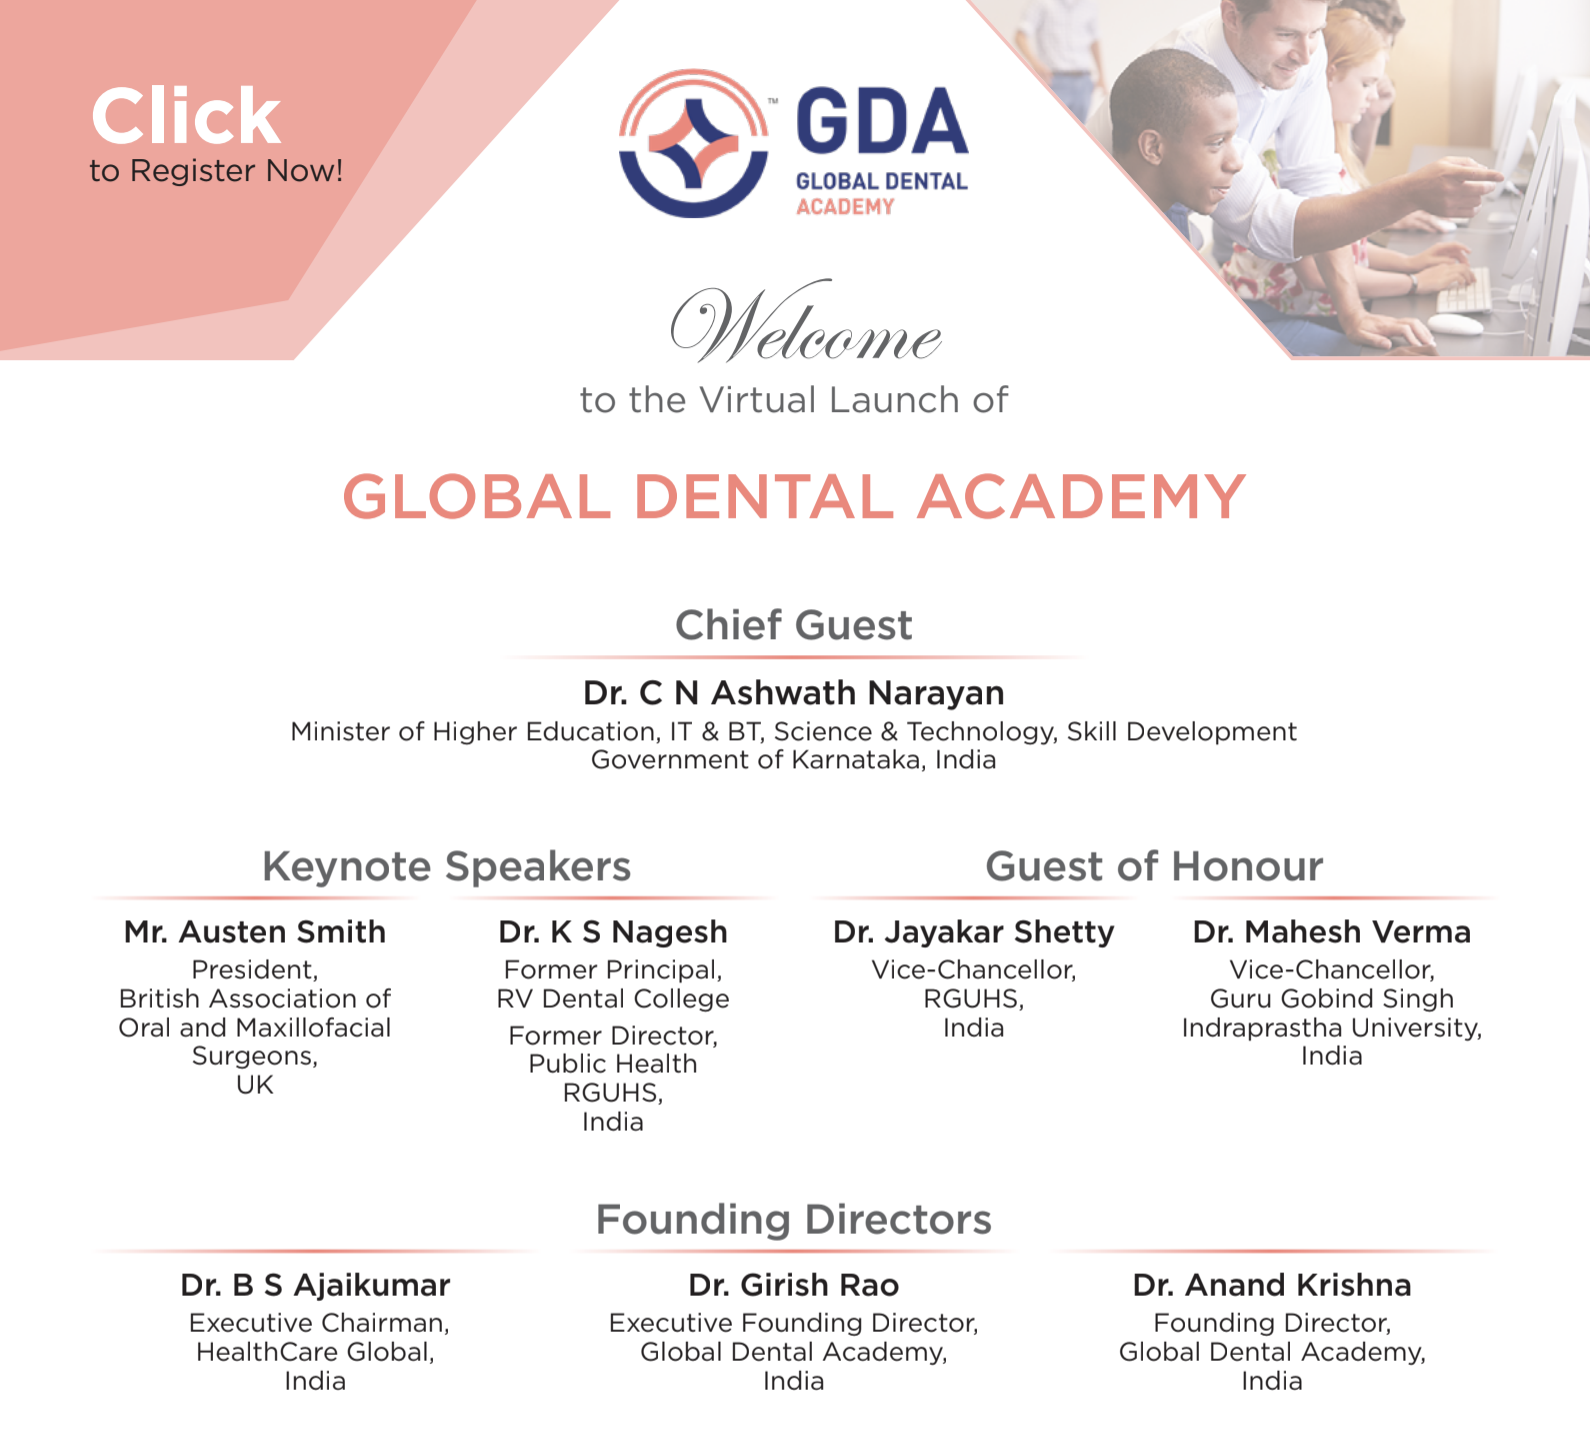 Global Dental Academy (GDA) virtual launch by Global Healthcare Academy (GHA)